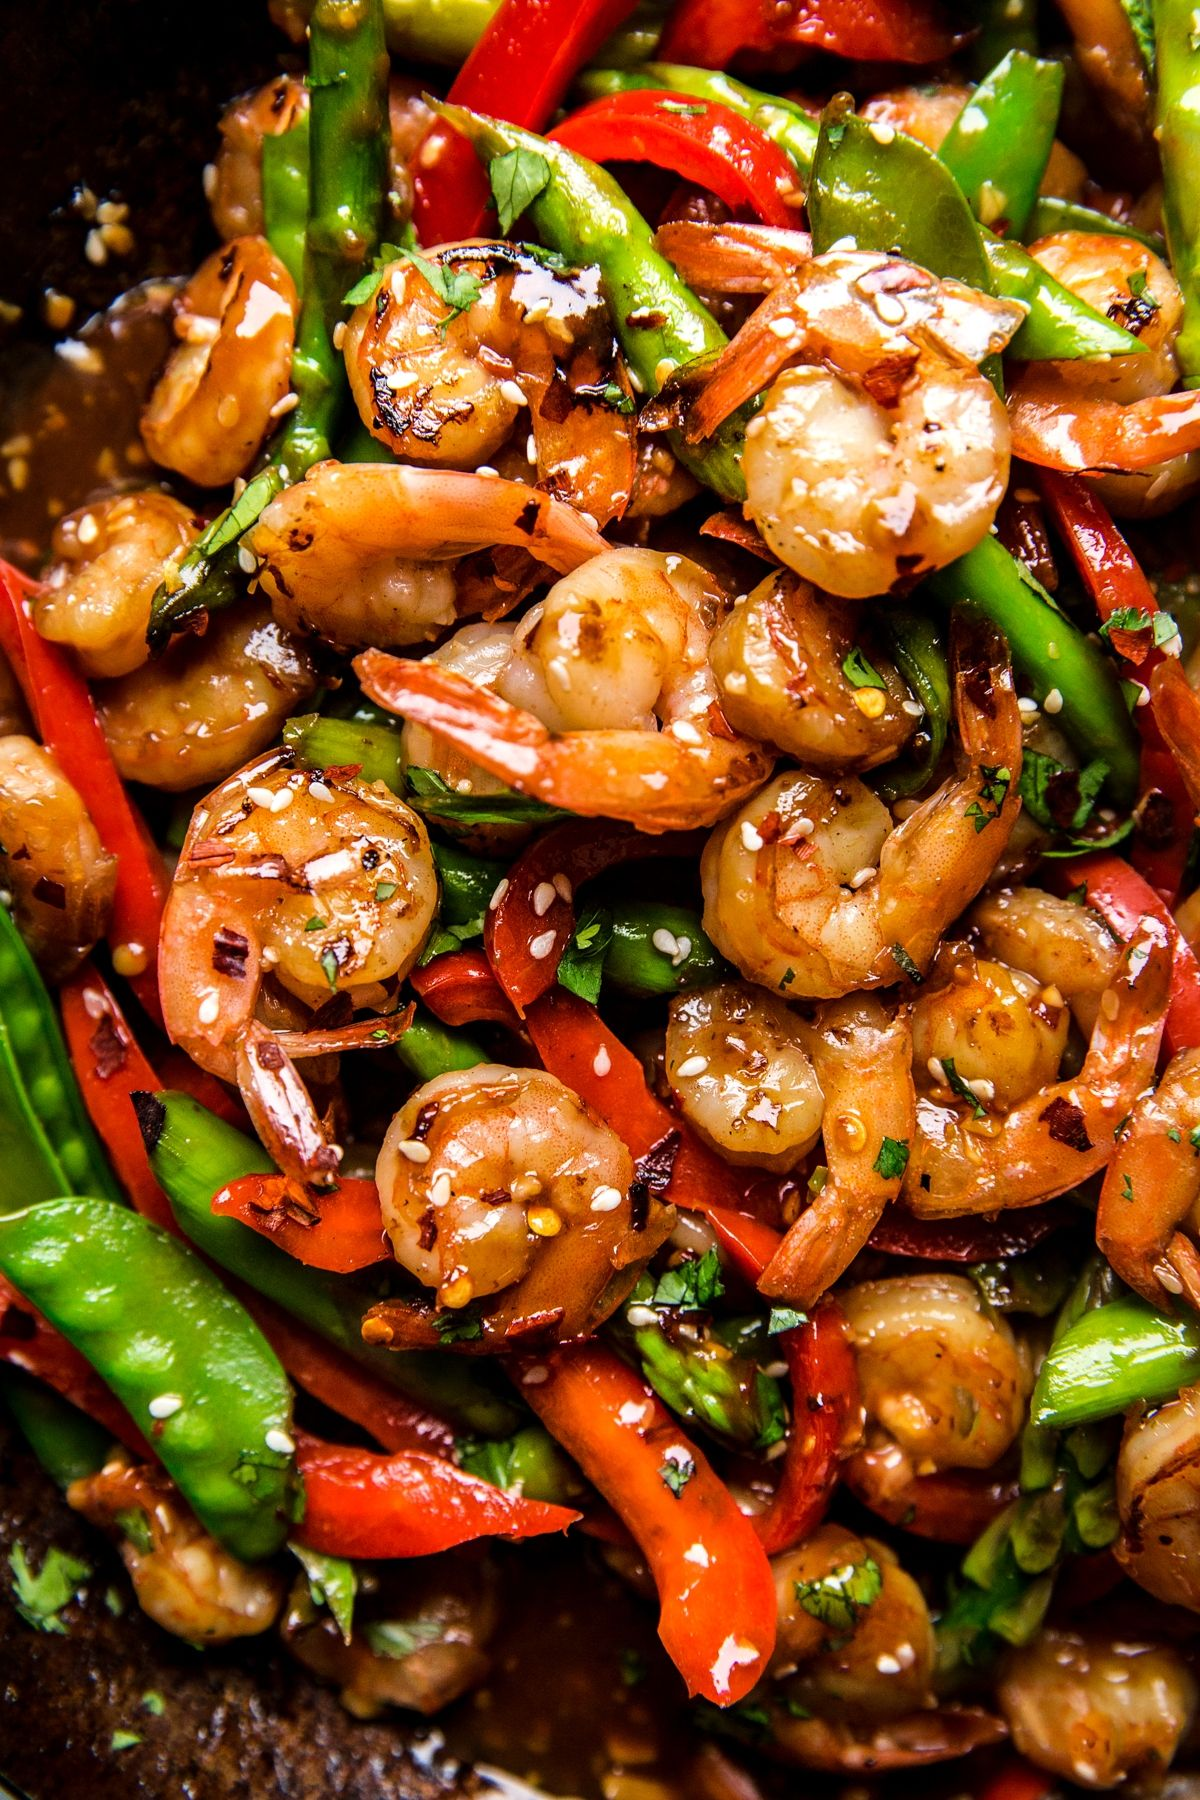 Garlic Shrimp Stir Fry | The Modern Proper